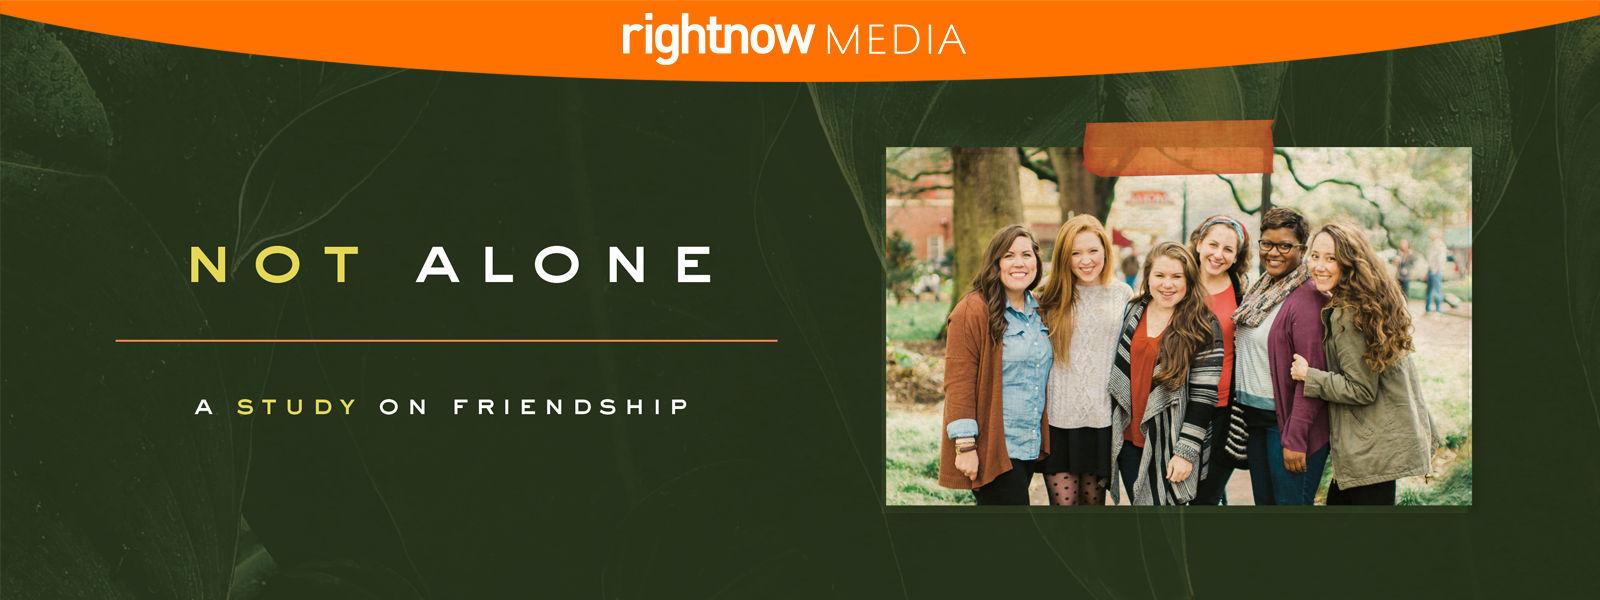 Not Alone: A Study on Friendship